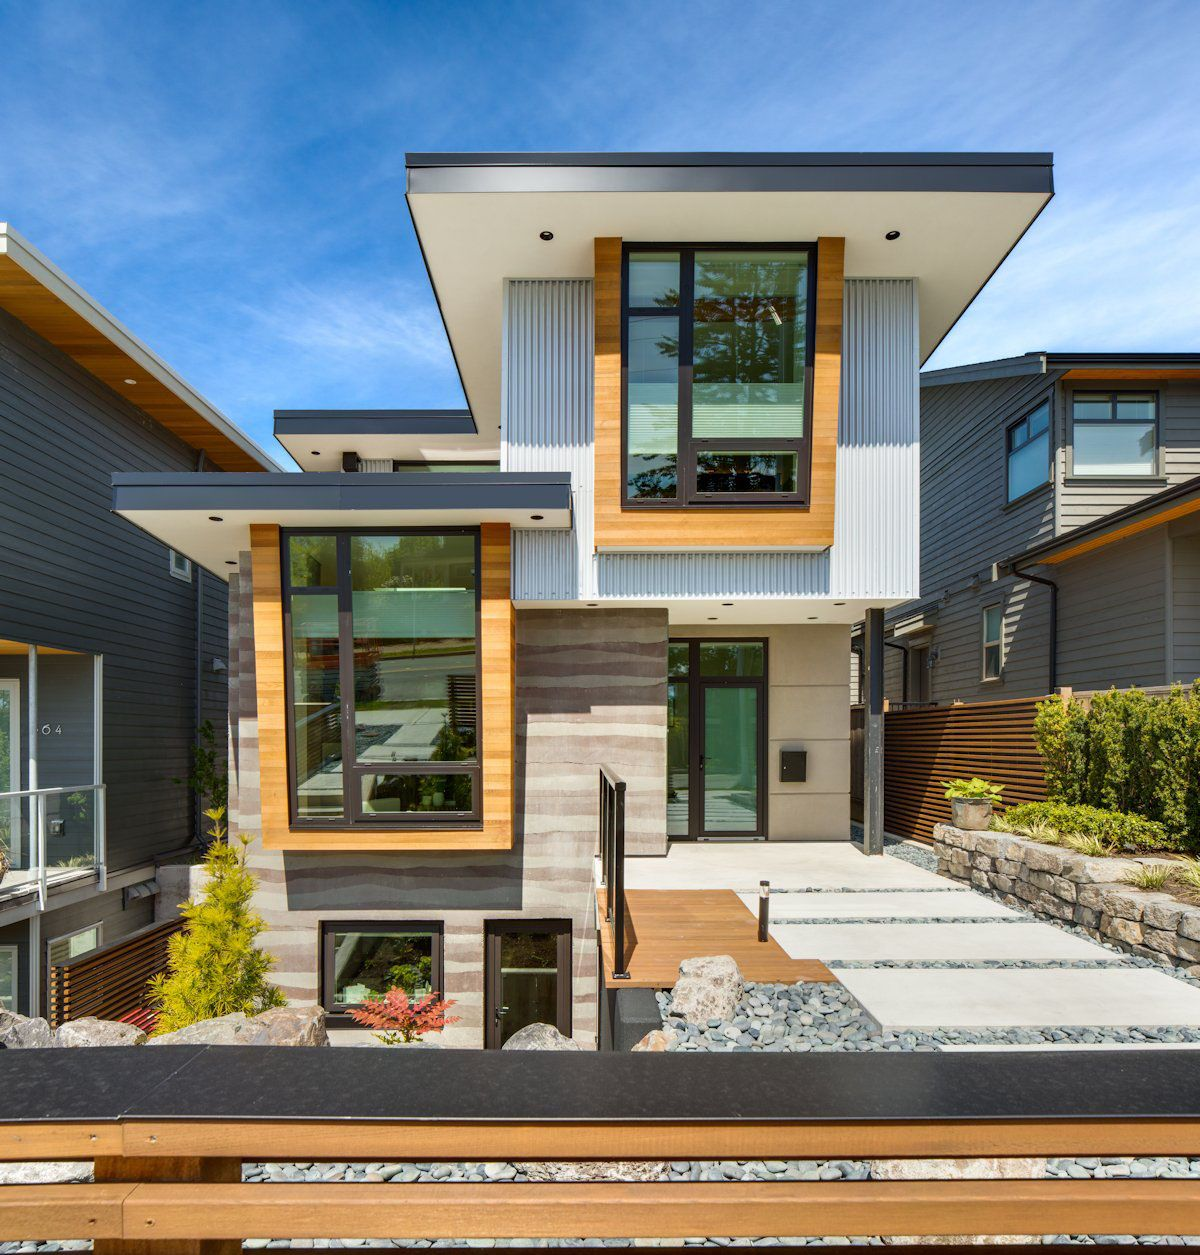 Green Home Design Ideas: Kerschbaumer Design